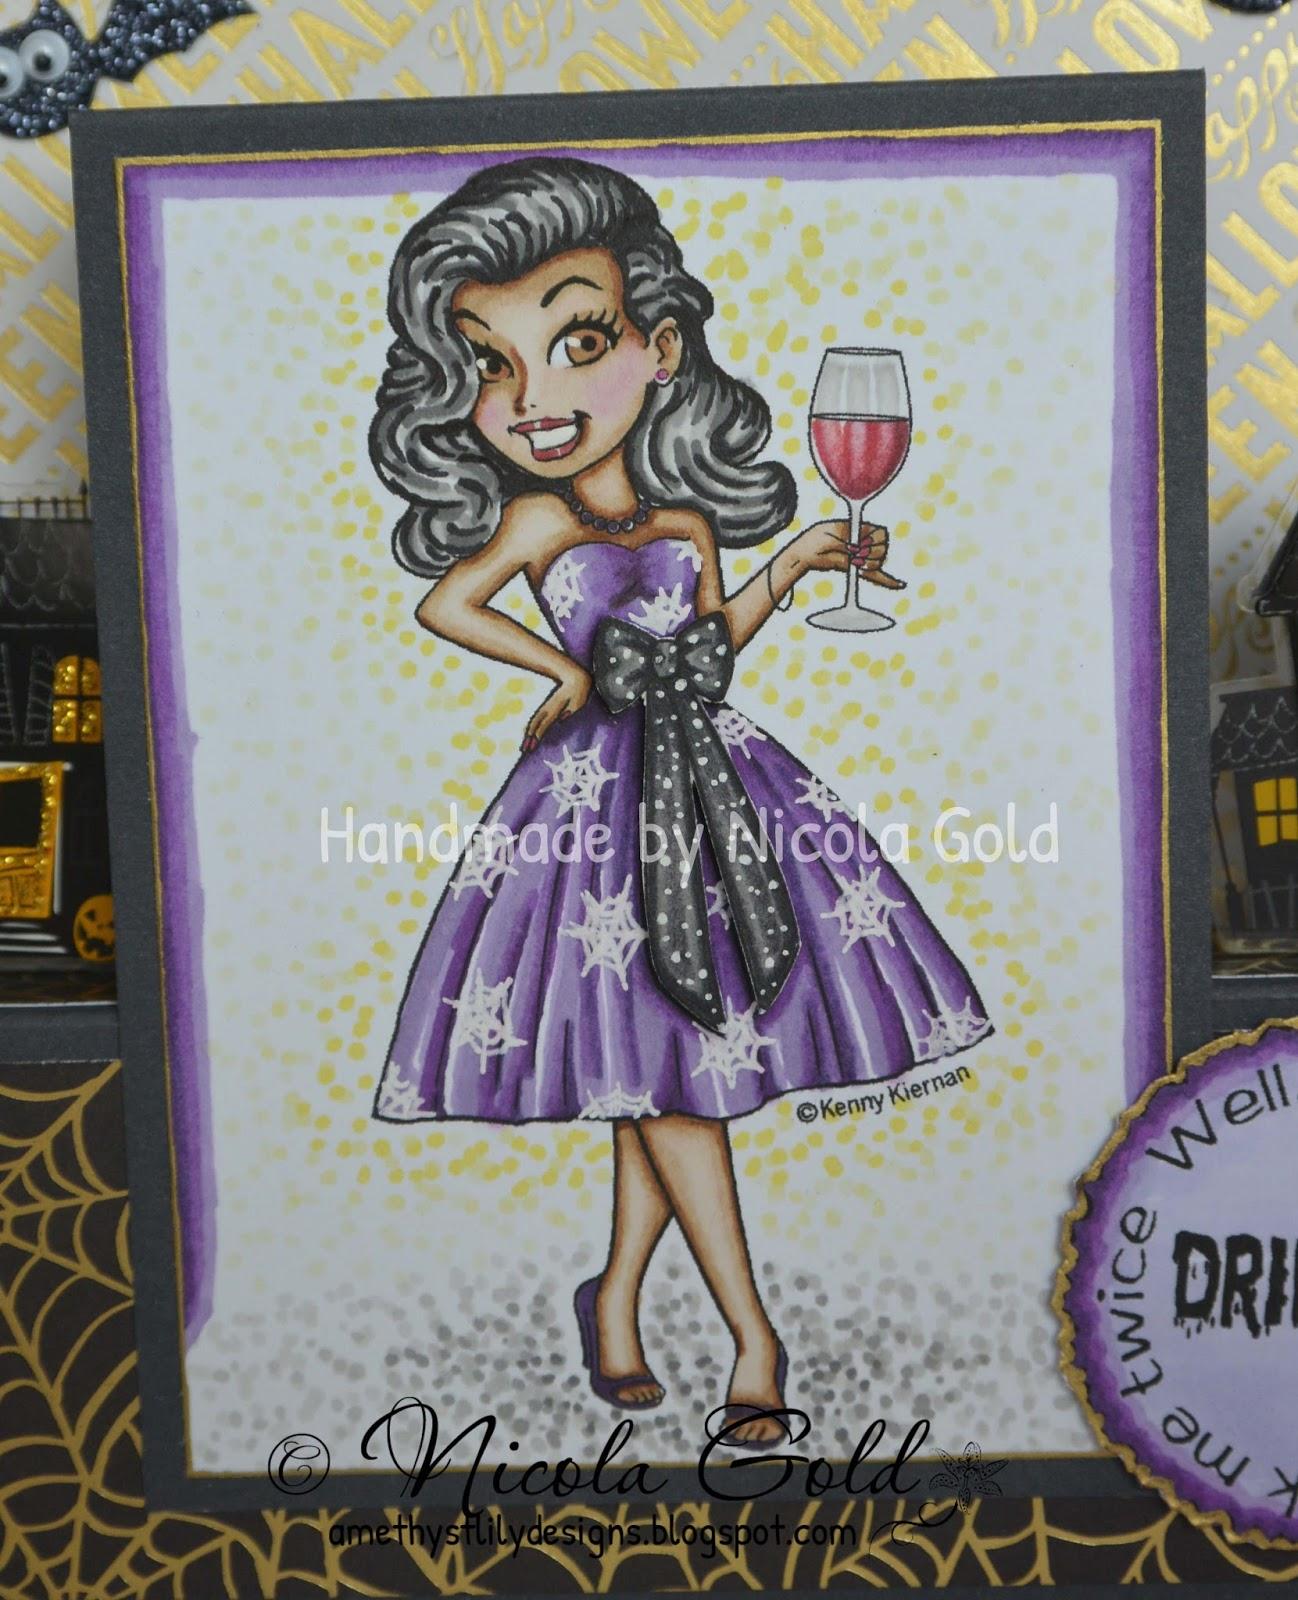 Amethyst Lily Designs Halloween Sentiments At Club Kennyk